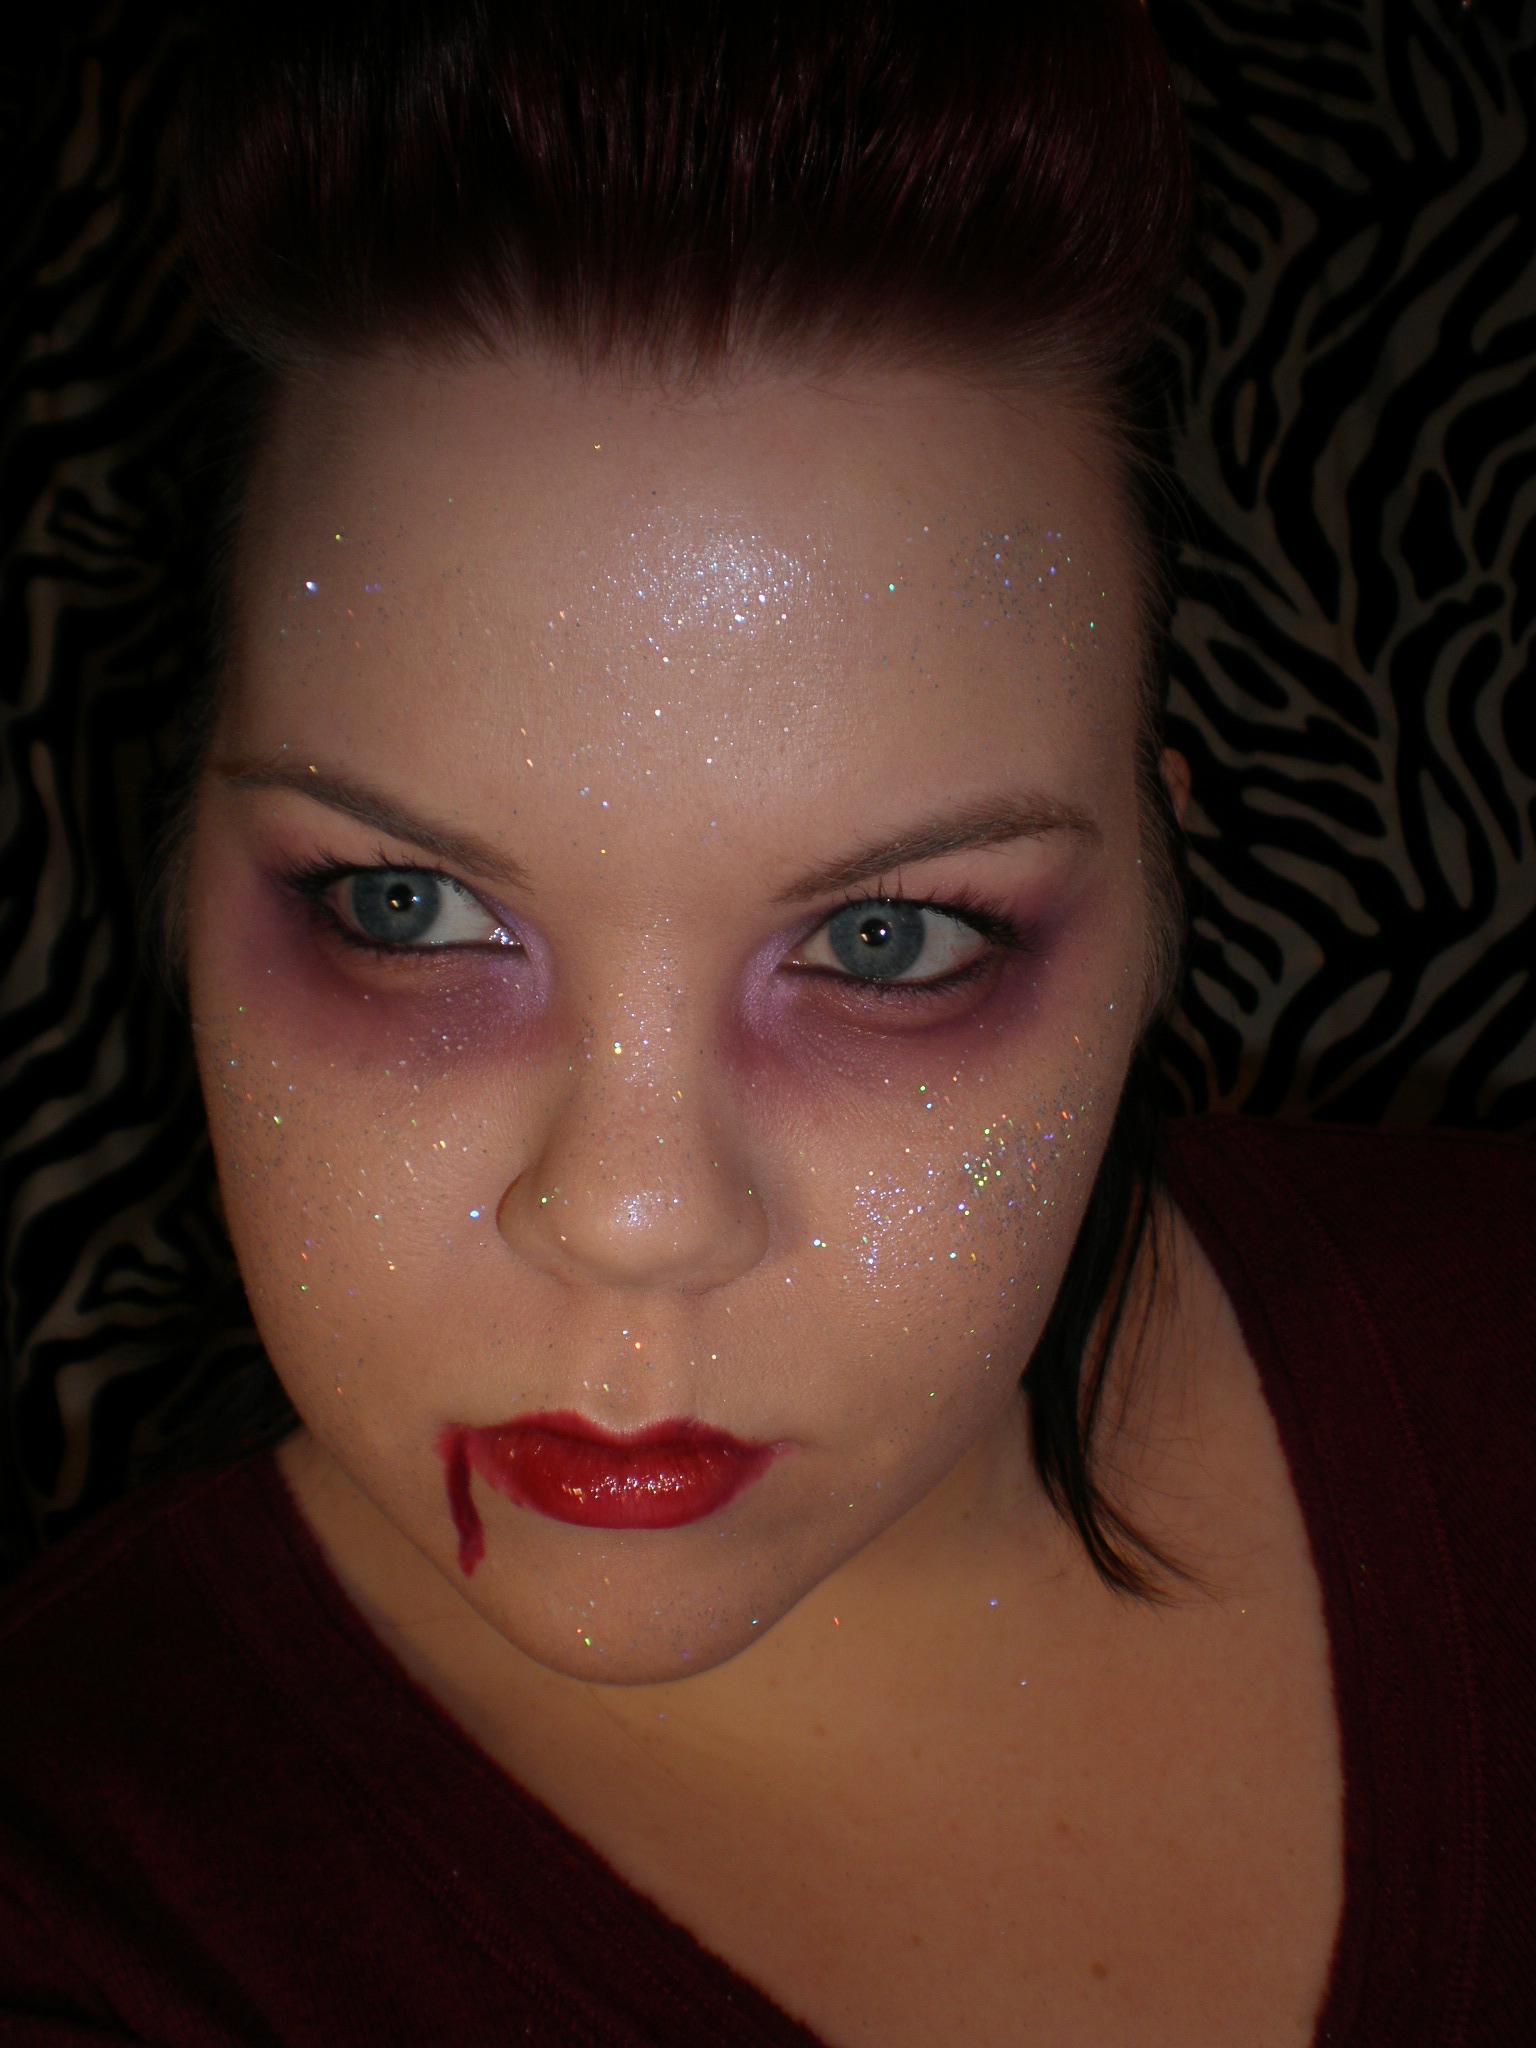 Twilight Vampire Easy and funny Halloween makeup - Classic Halloween Makeup